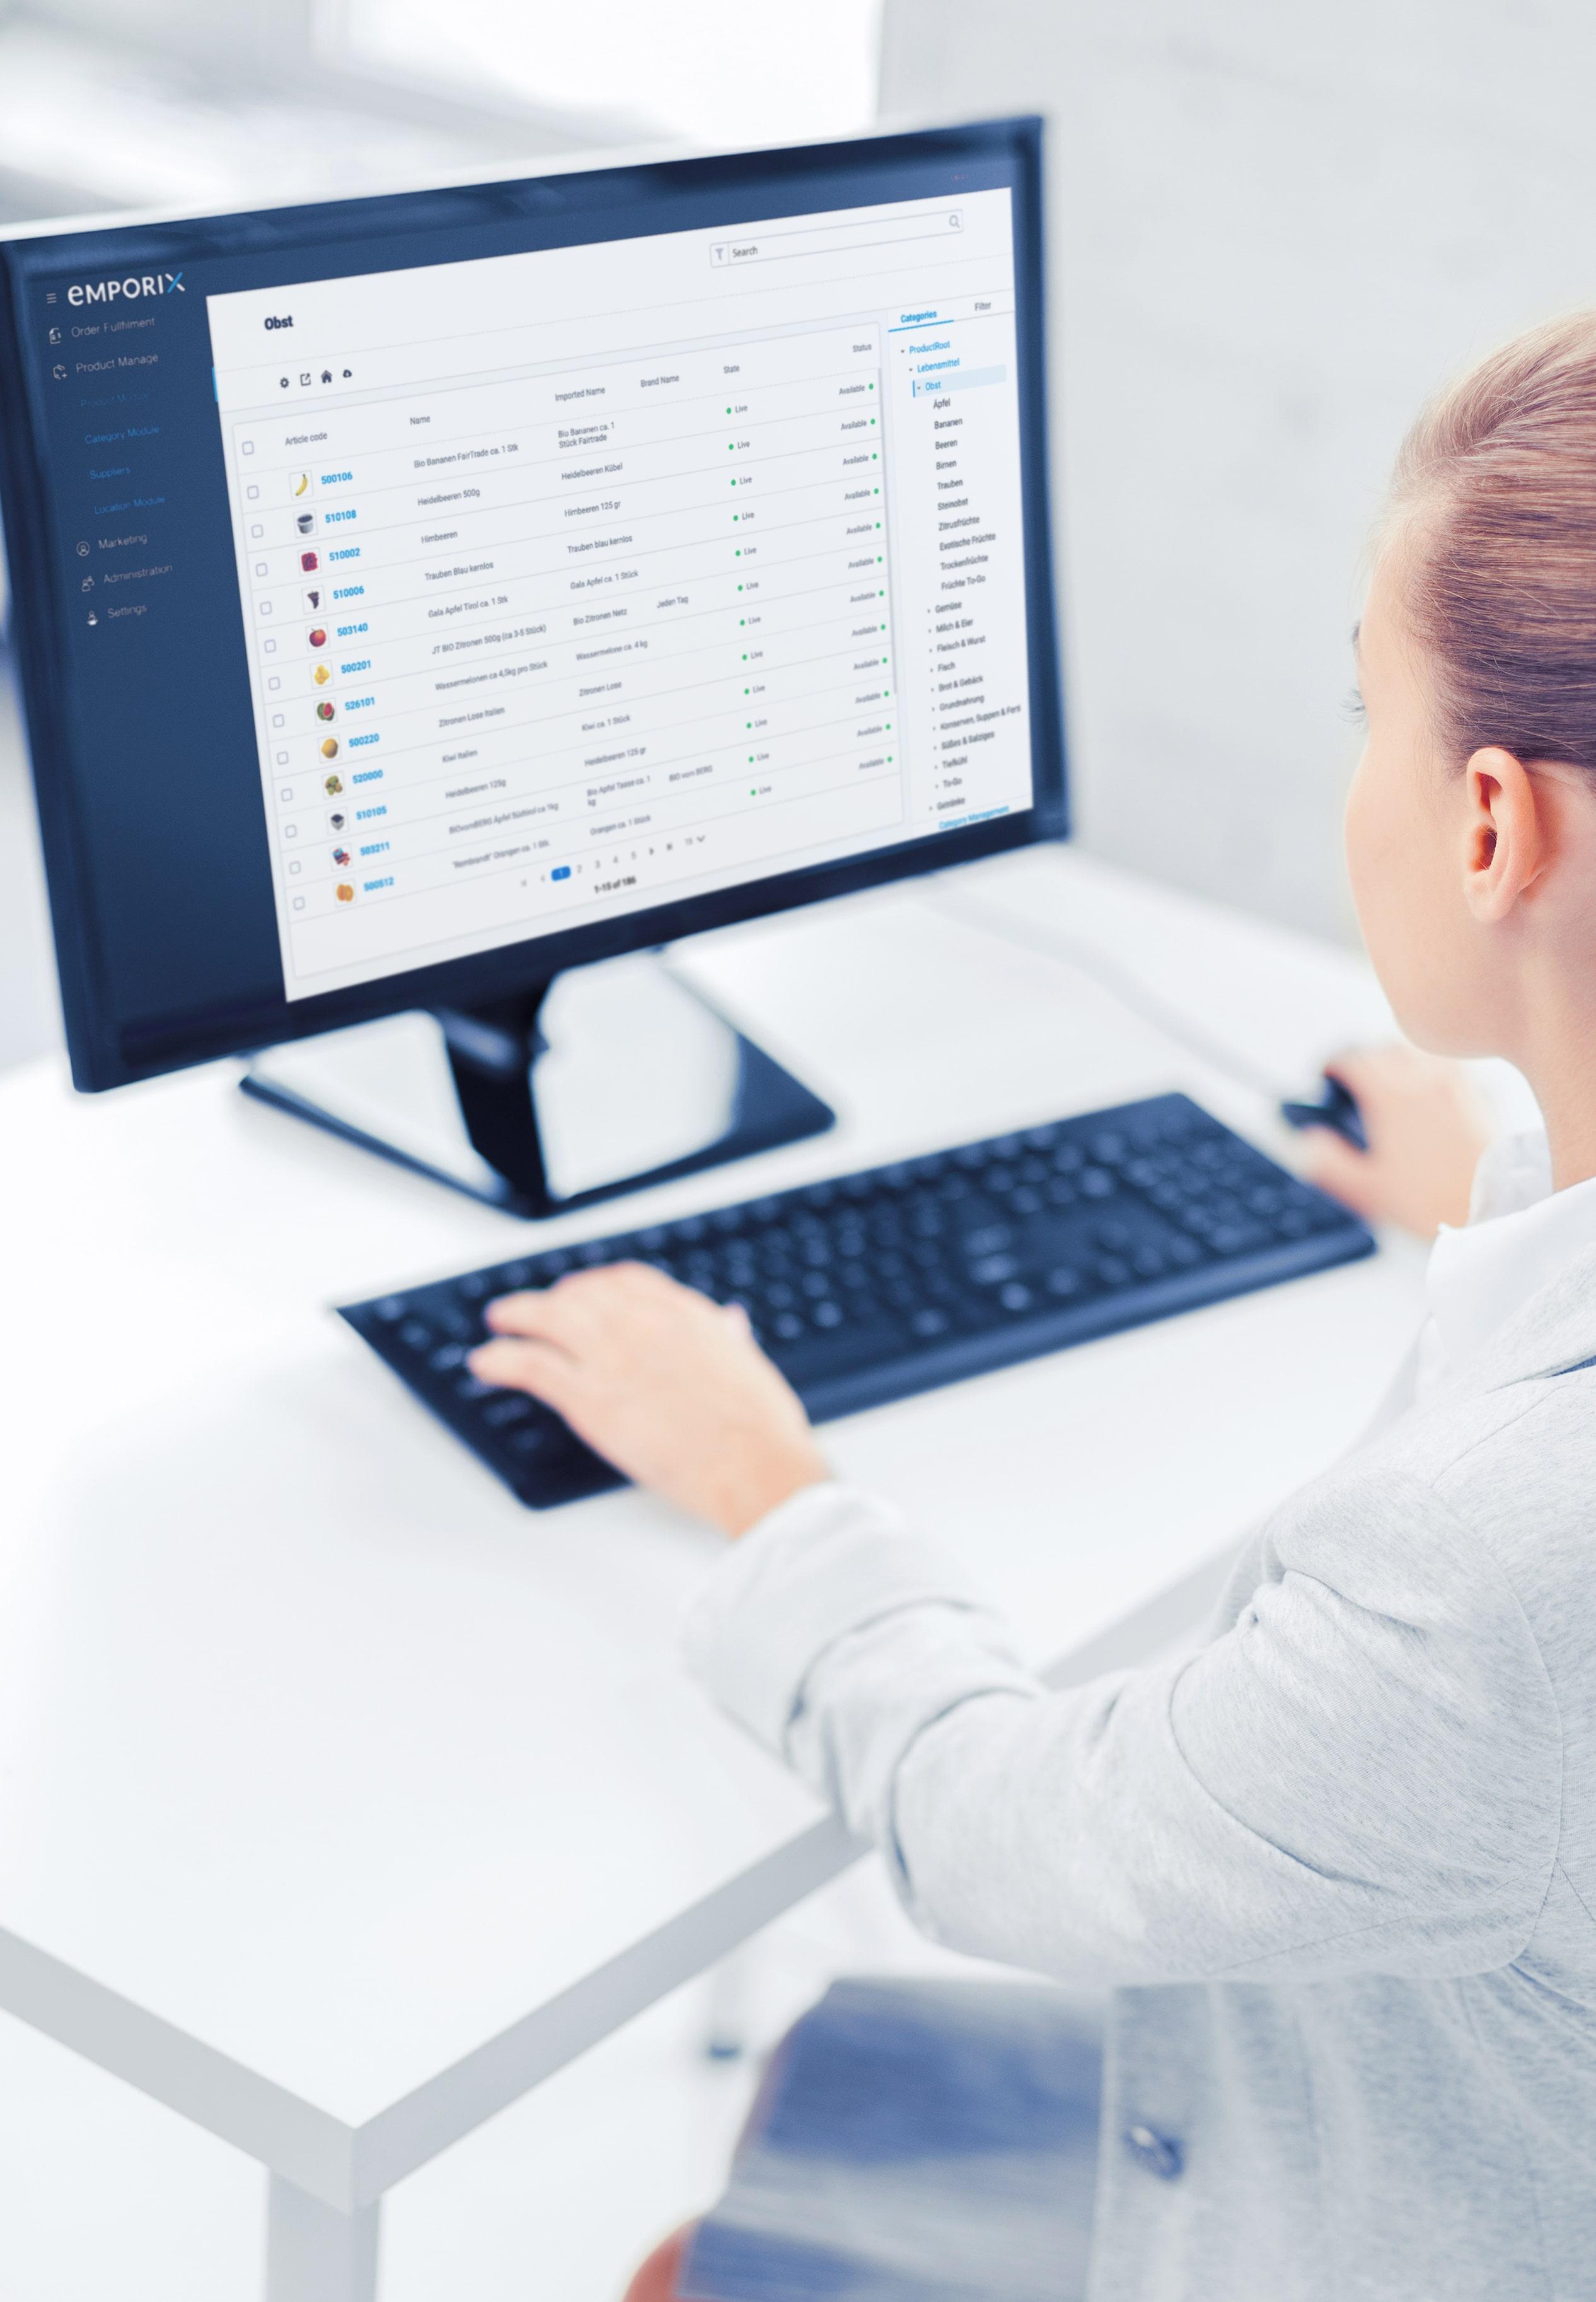 Emporix Digital Commerce Platform